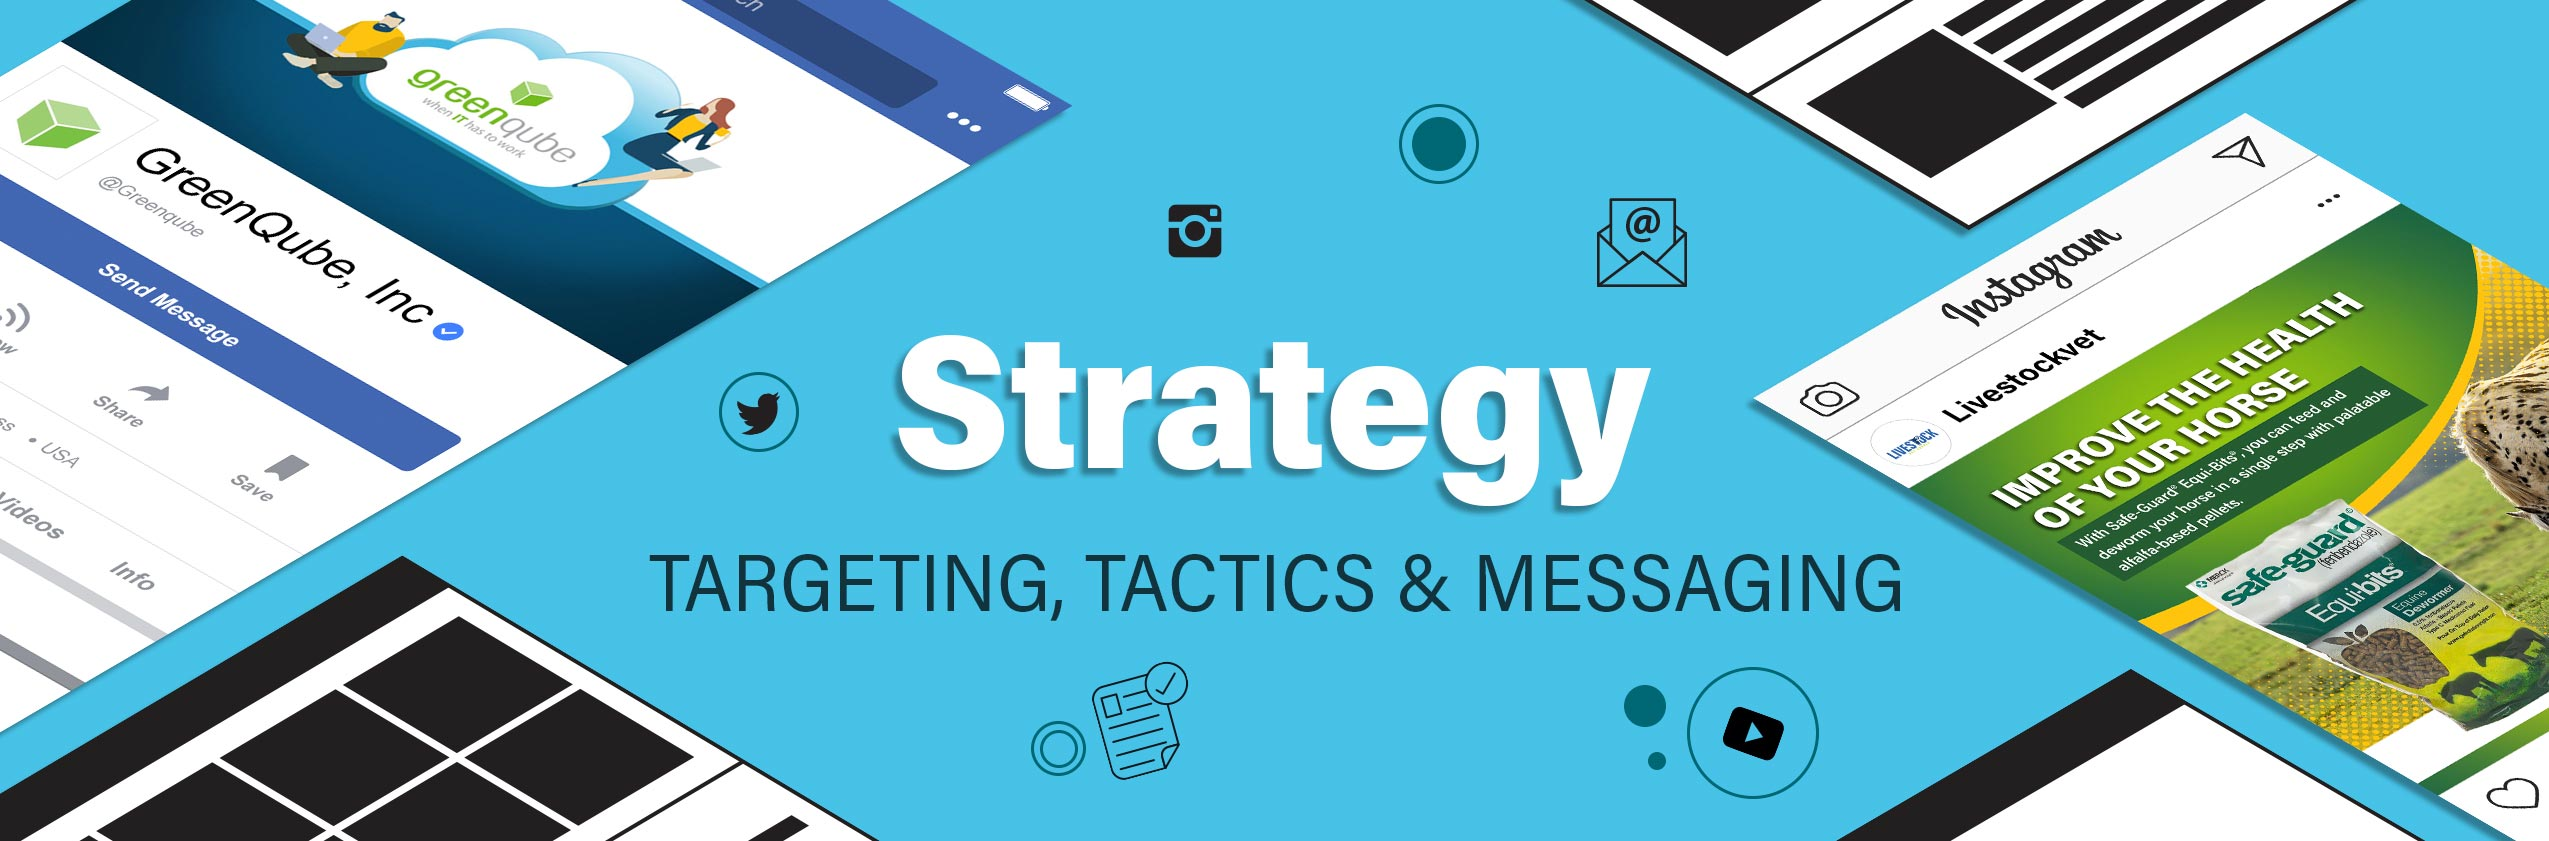 Strategy-header-v2